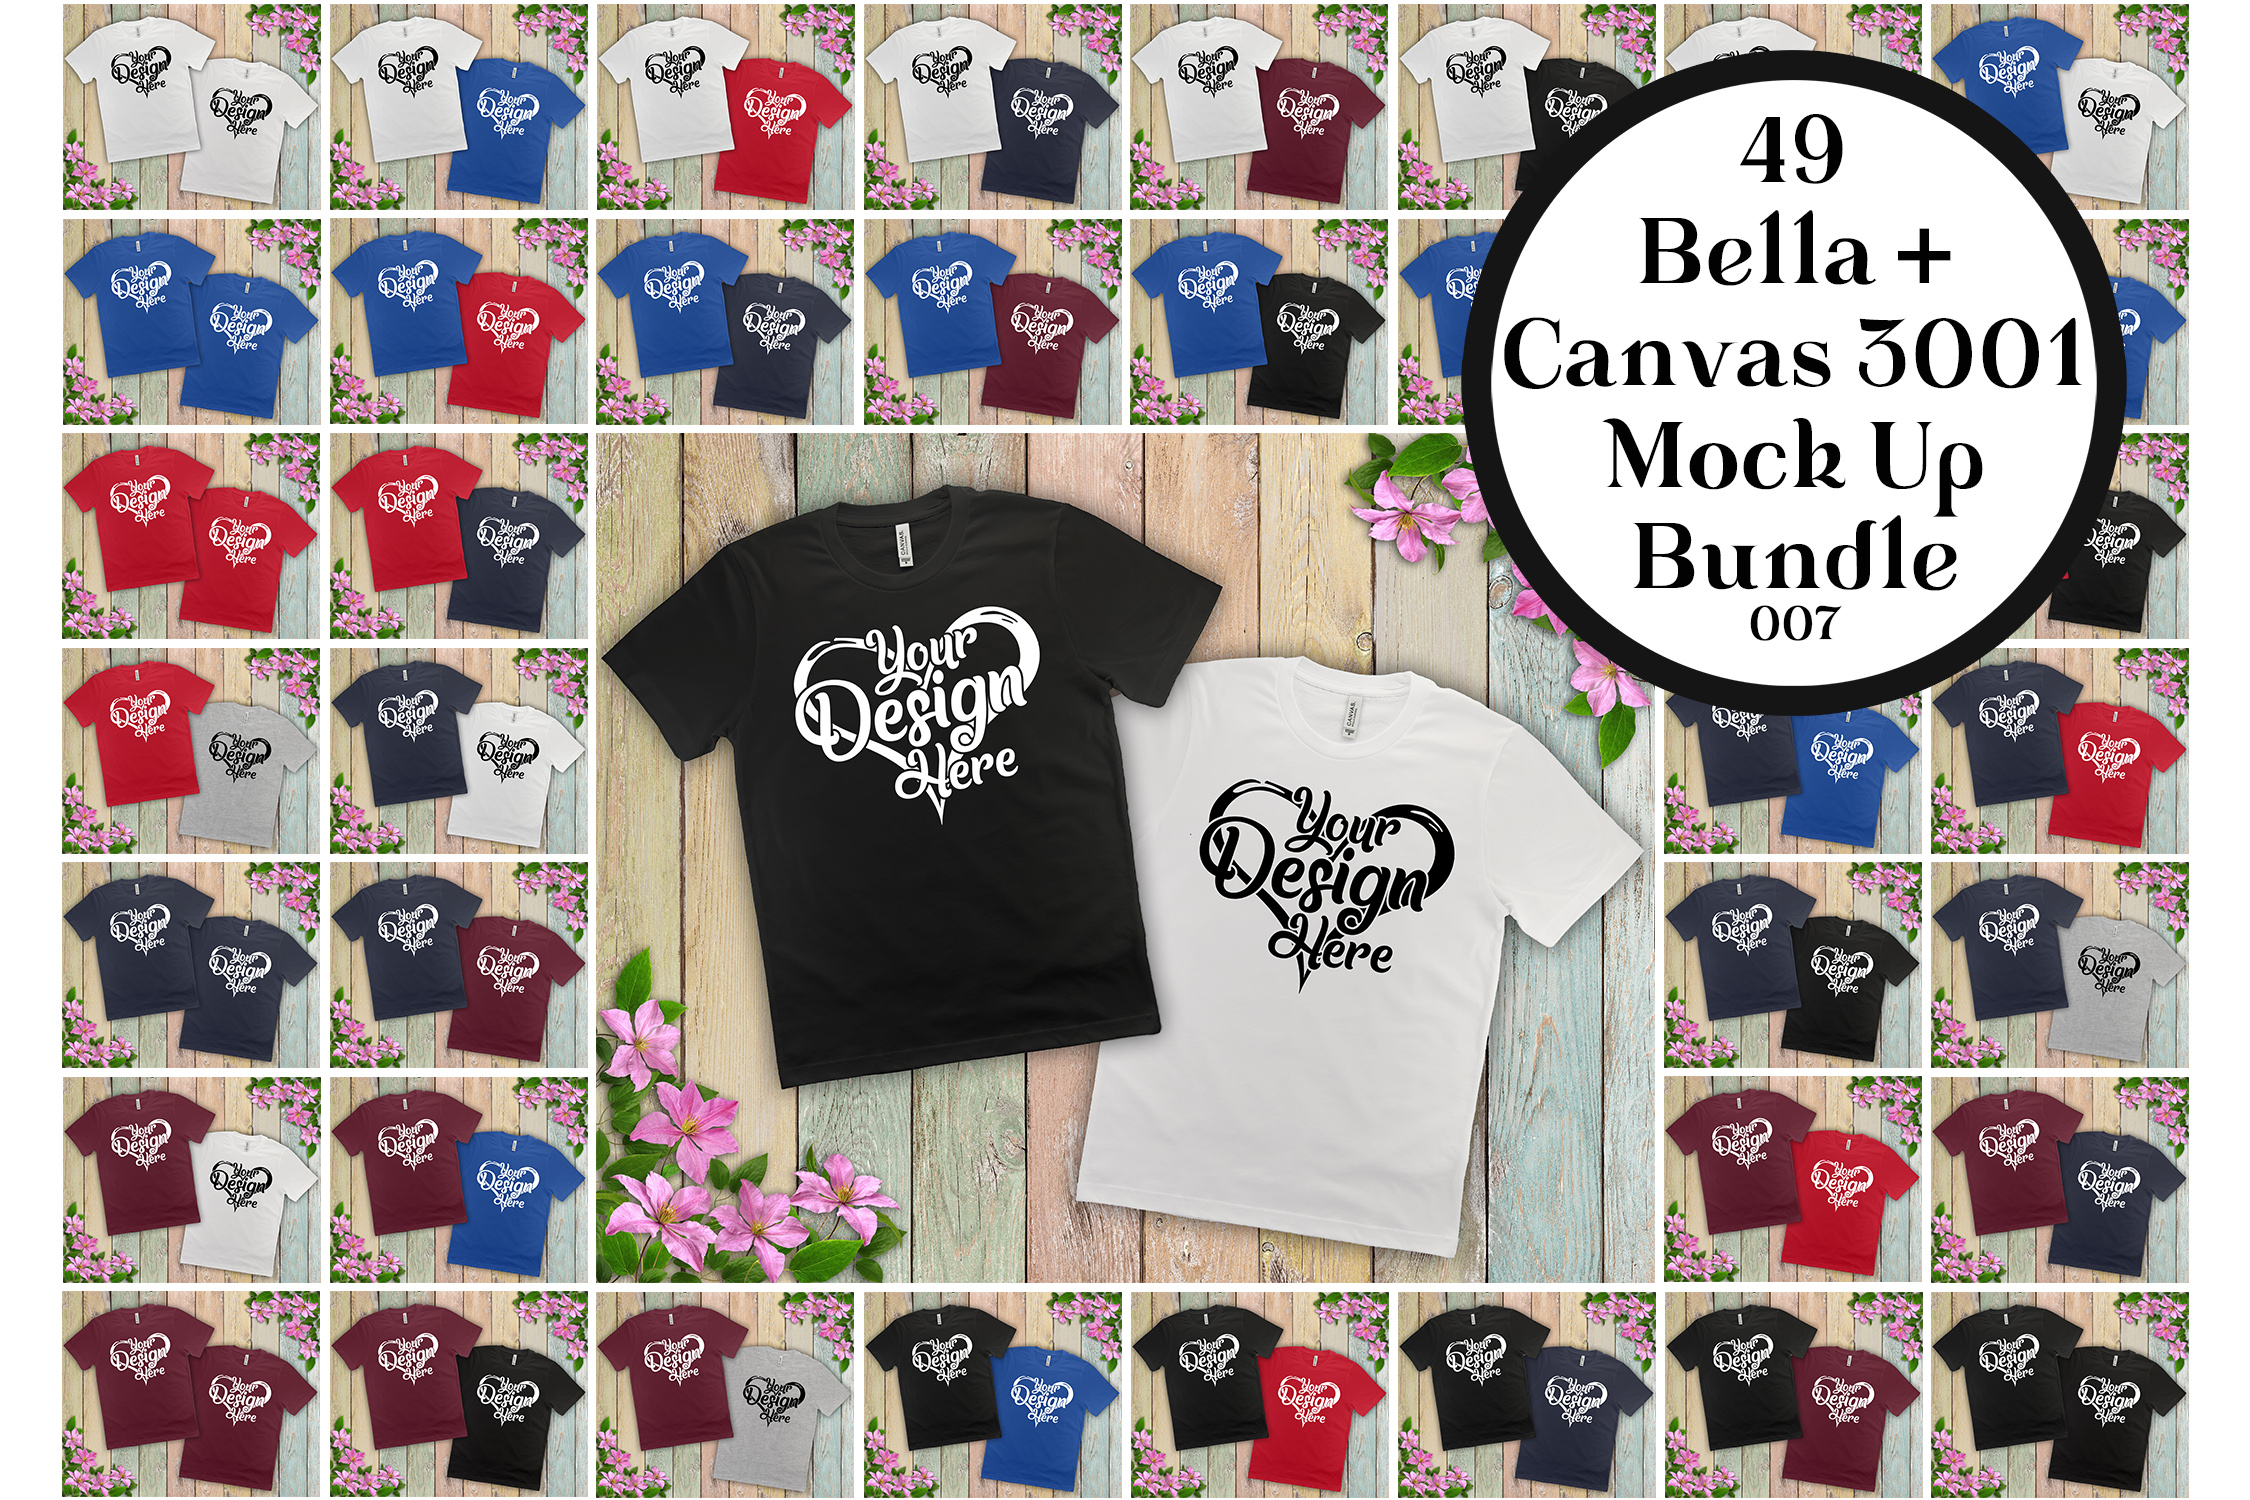 161 Bella Canvas 300 Mockups Mega Bundle Flat Lay T-Shirts example image 5